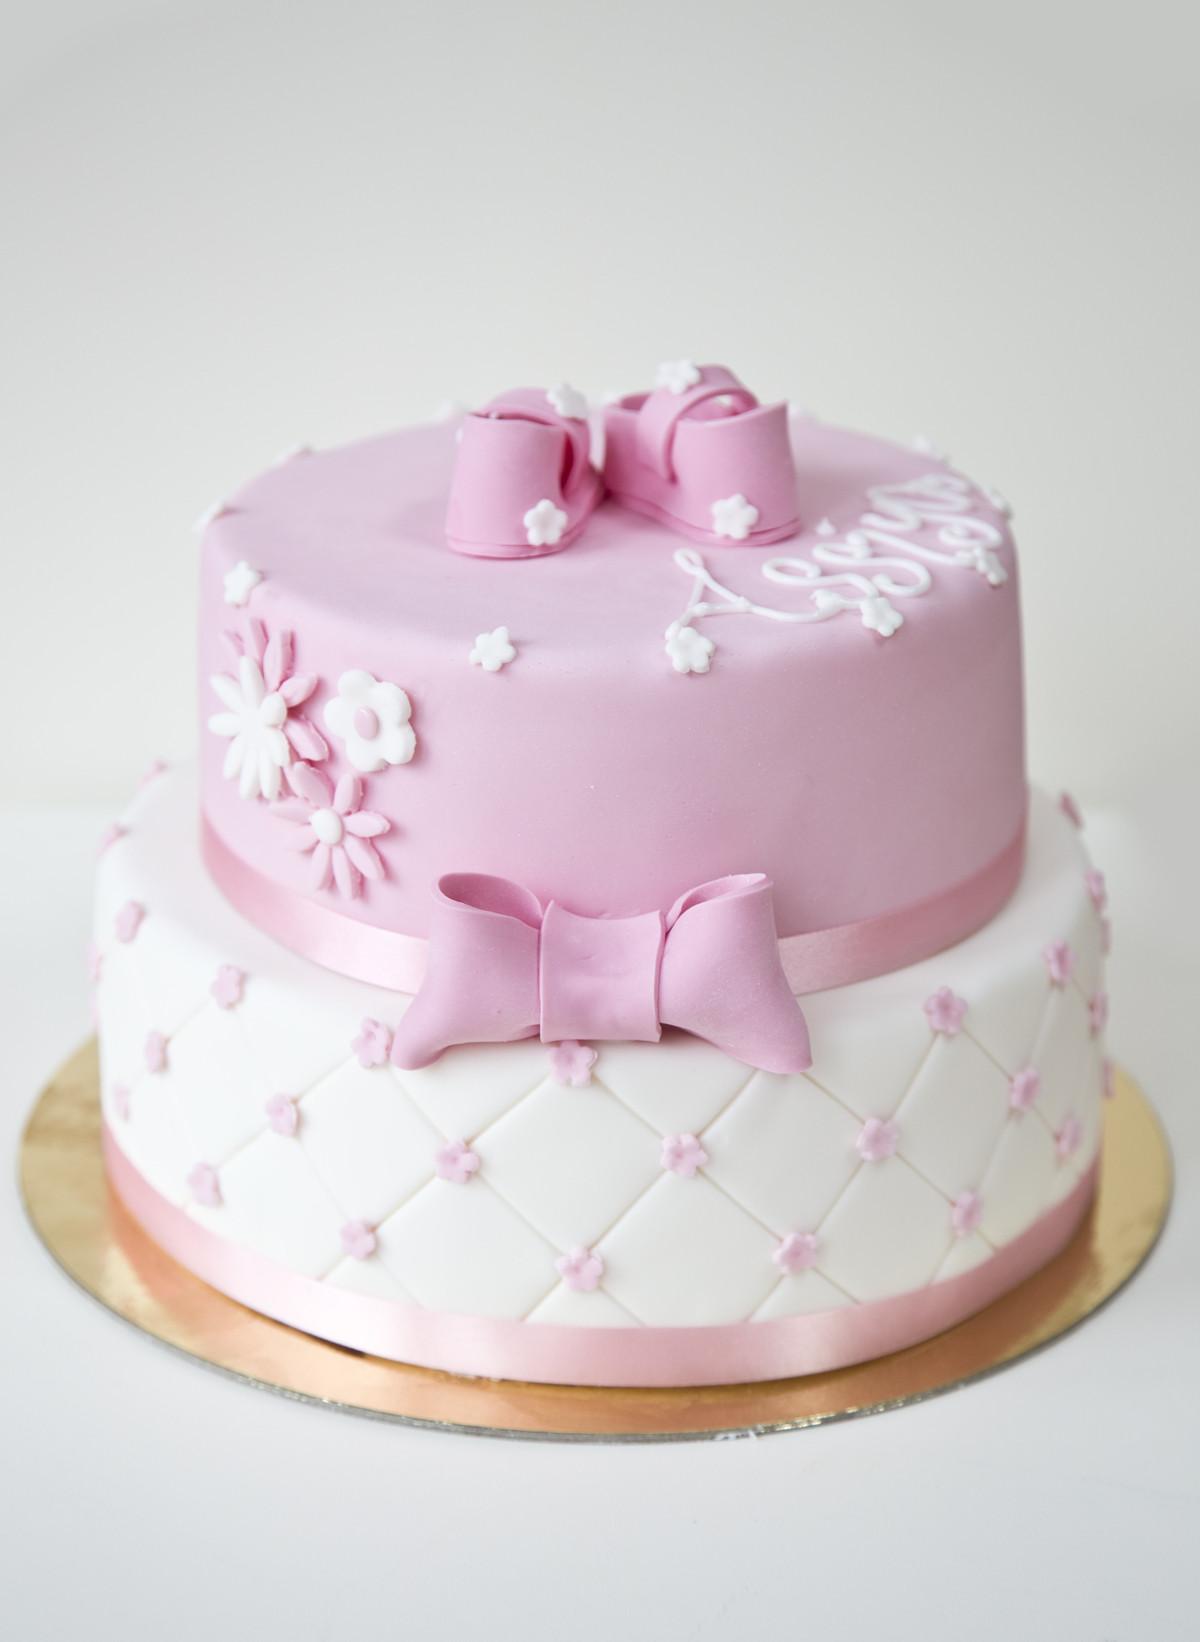 Baby Geburtstagstorte  Baby Party Torte 2